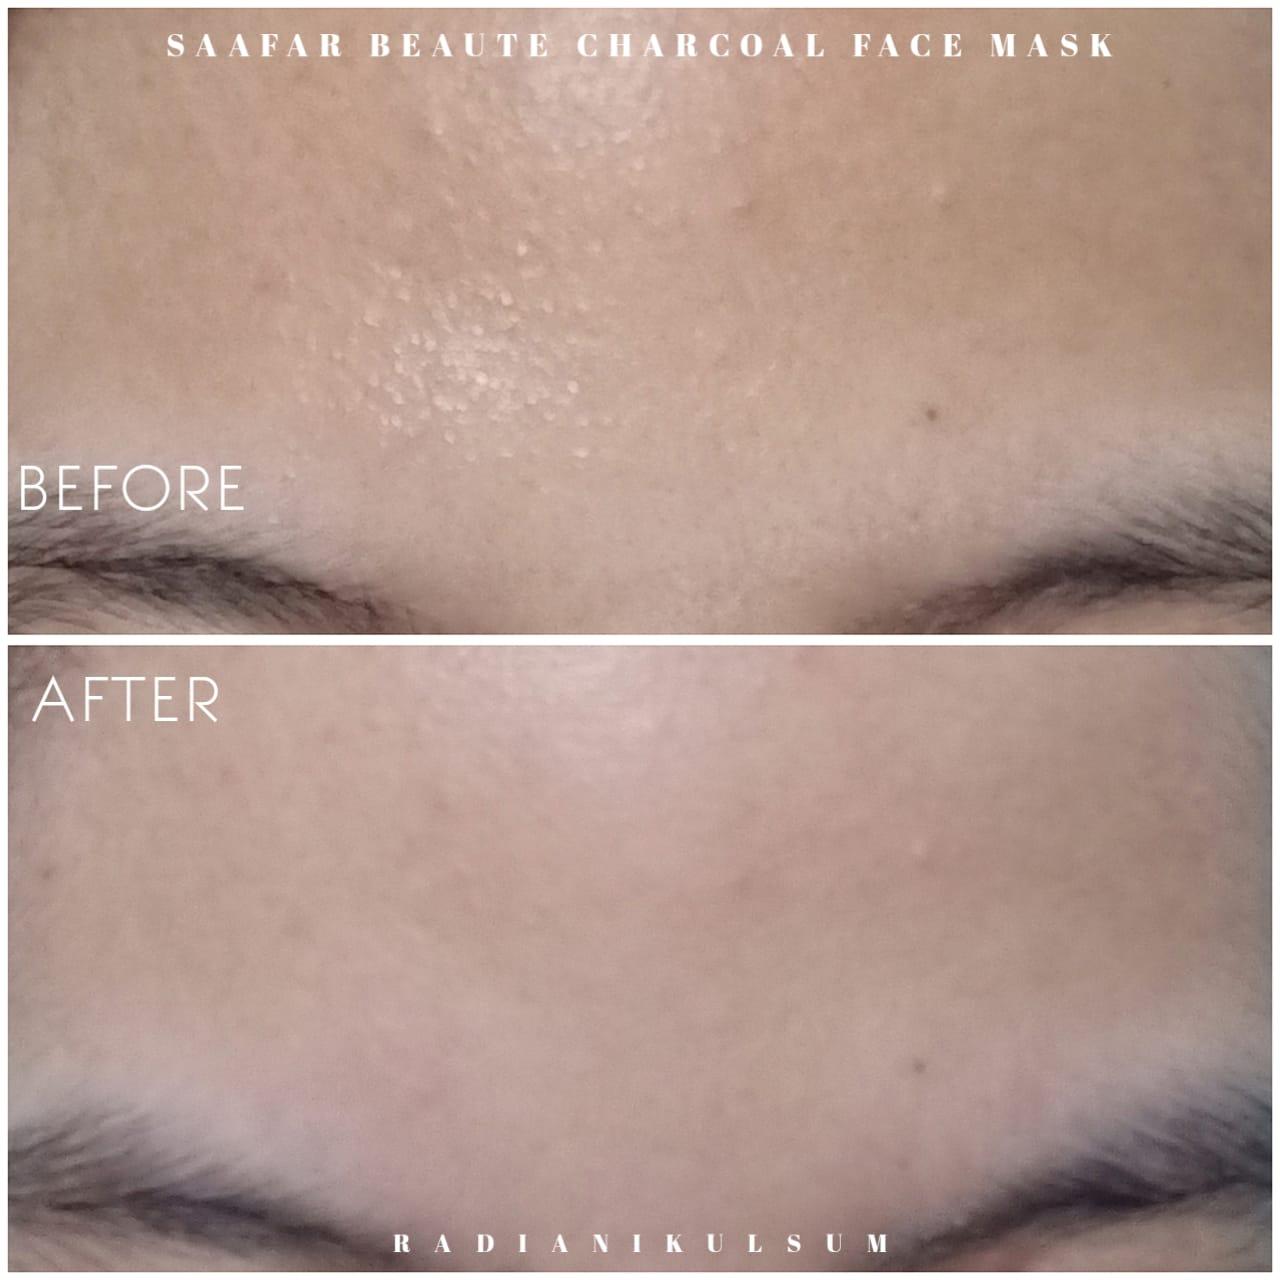 before-after pemakaian masker charcoal Saafar Beaute di dahi